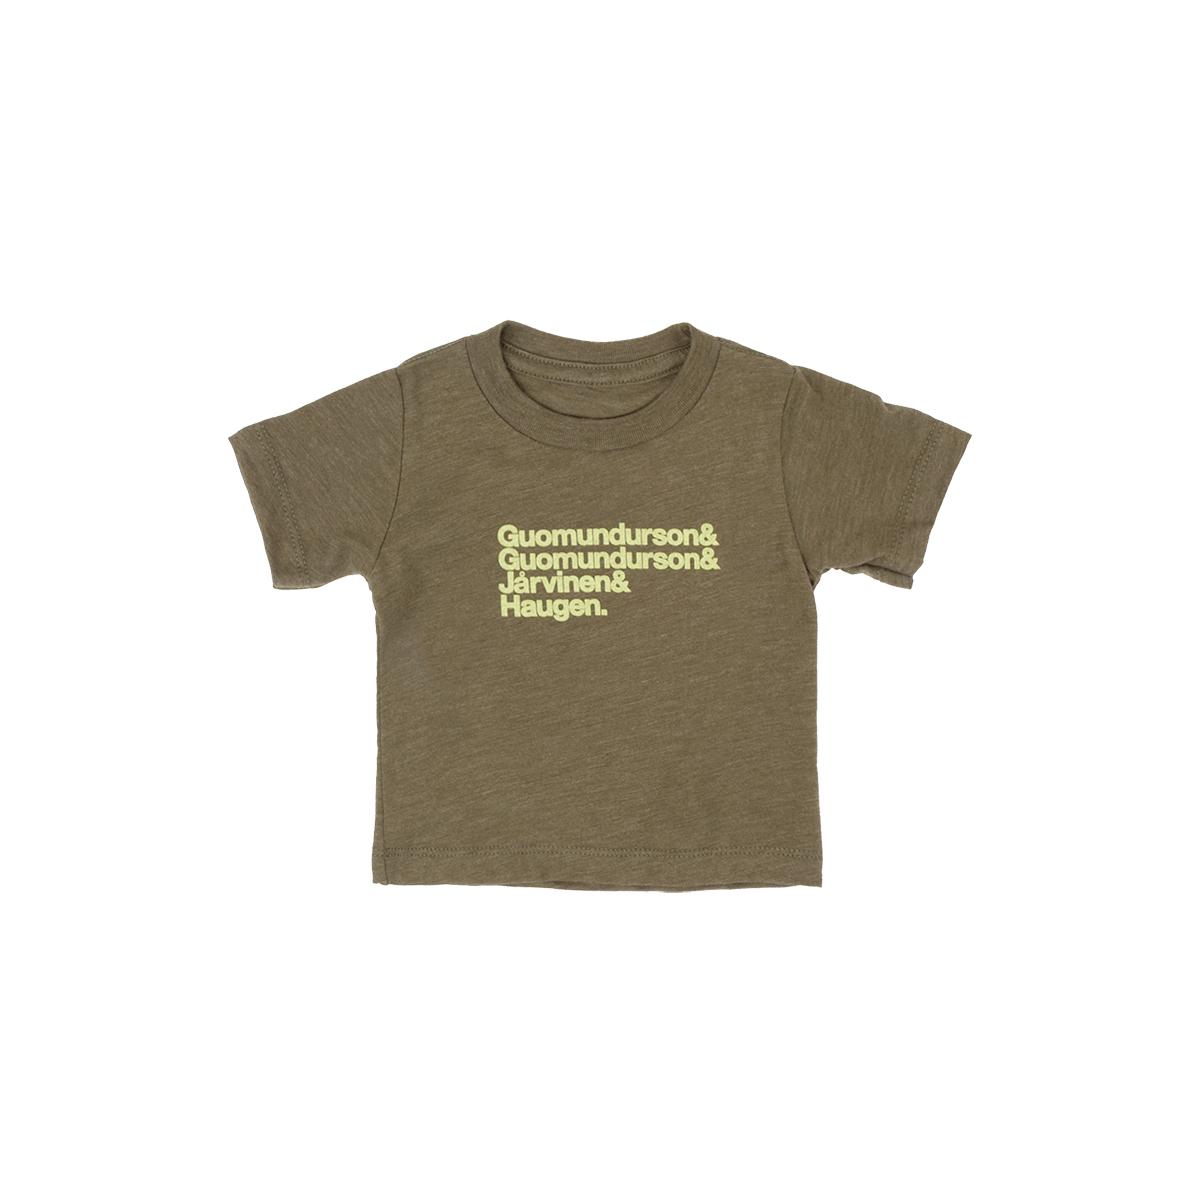 Kasvot Vaxt Nomenclature Baby Tee on Olive